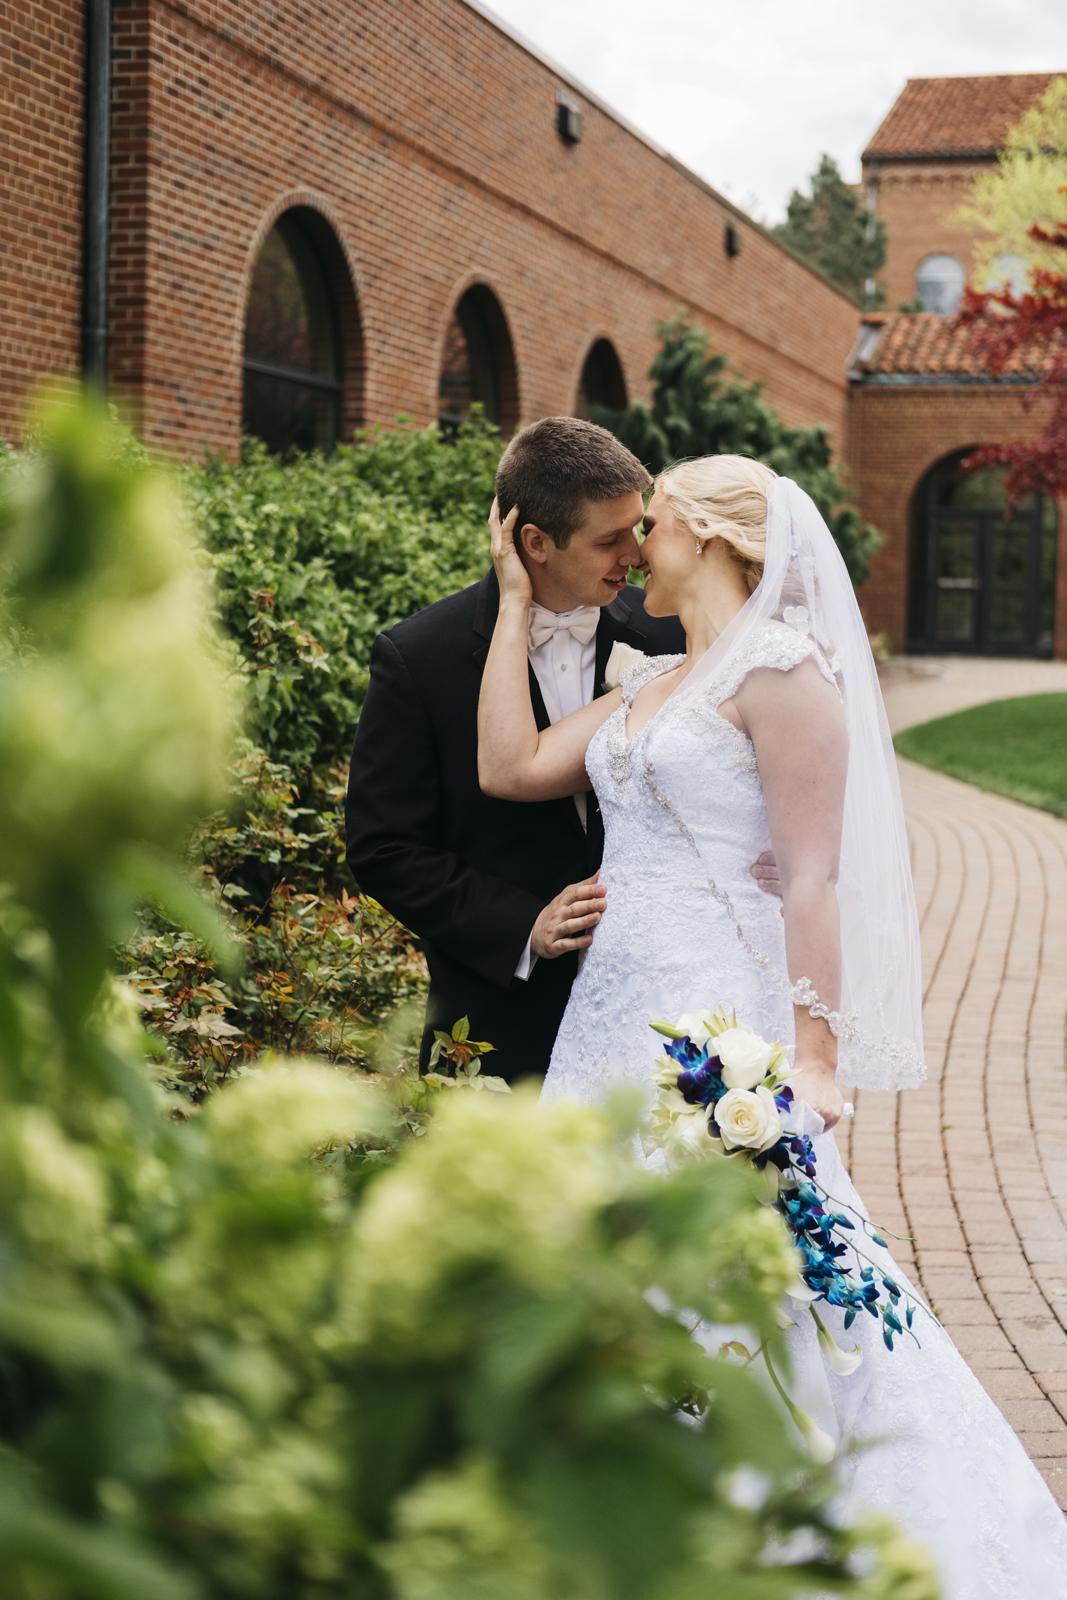 Bride and groom at The Inn at St. John's wedding.